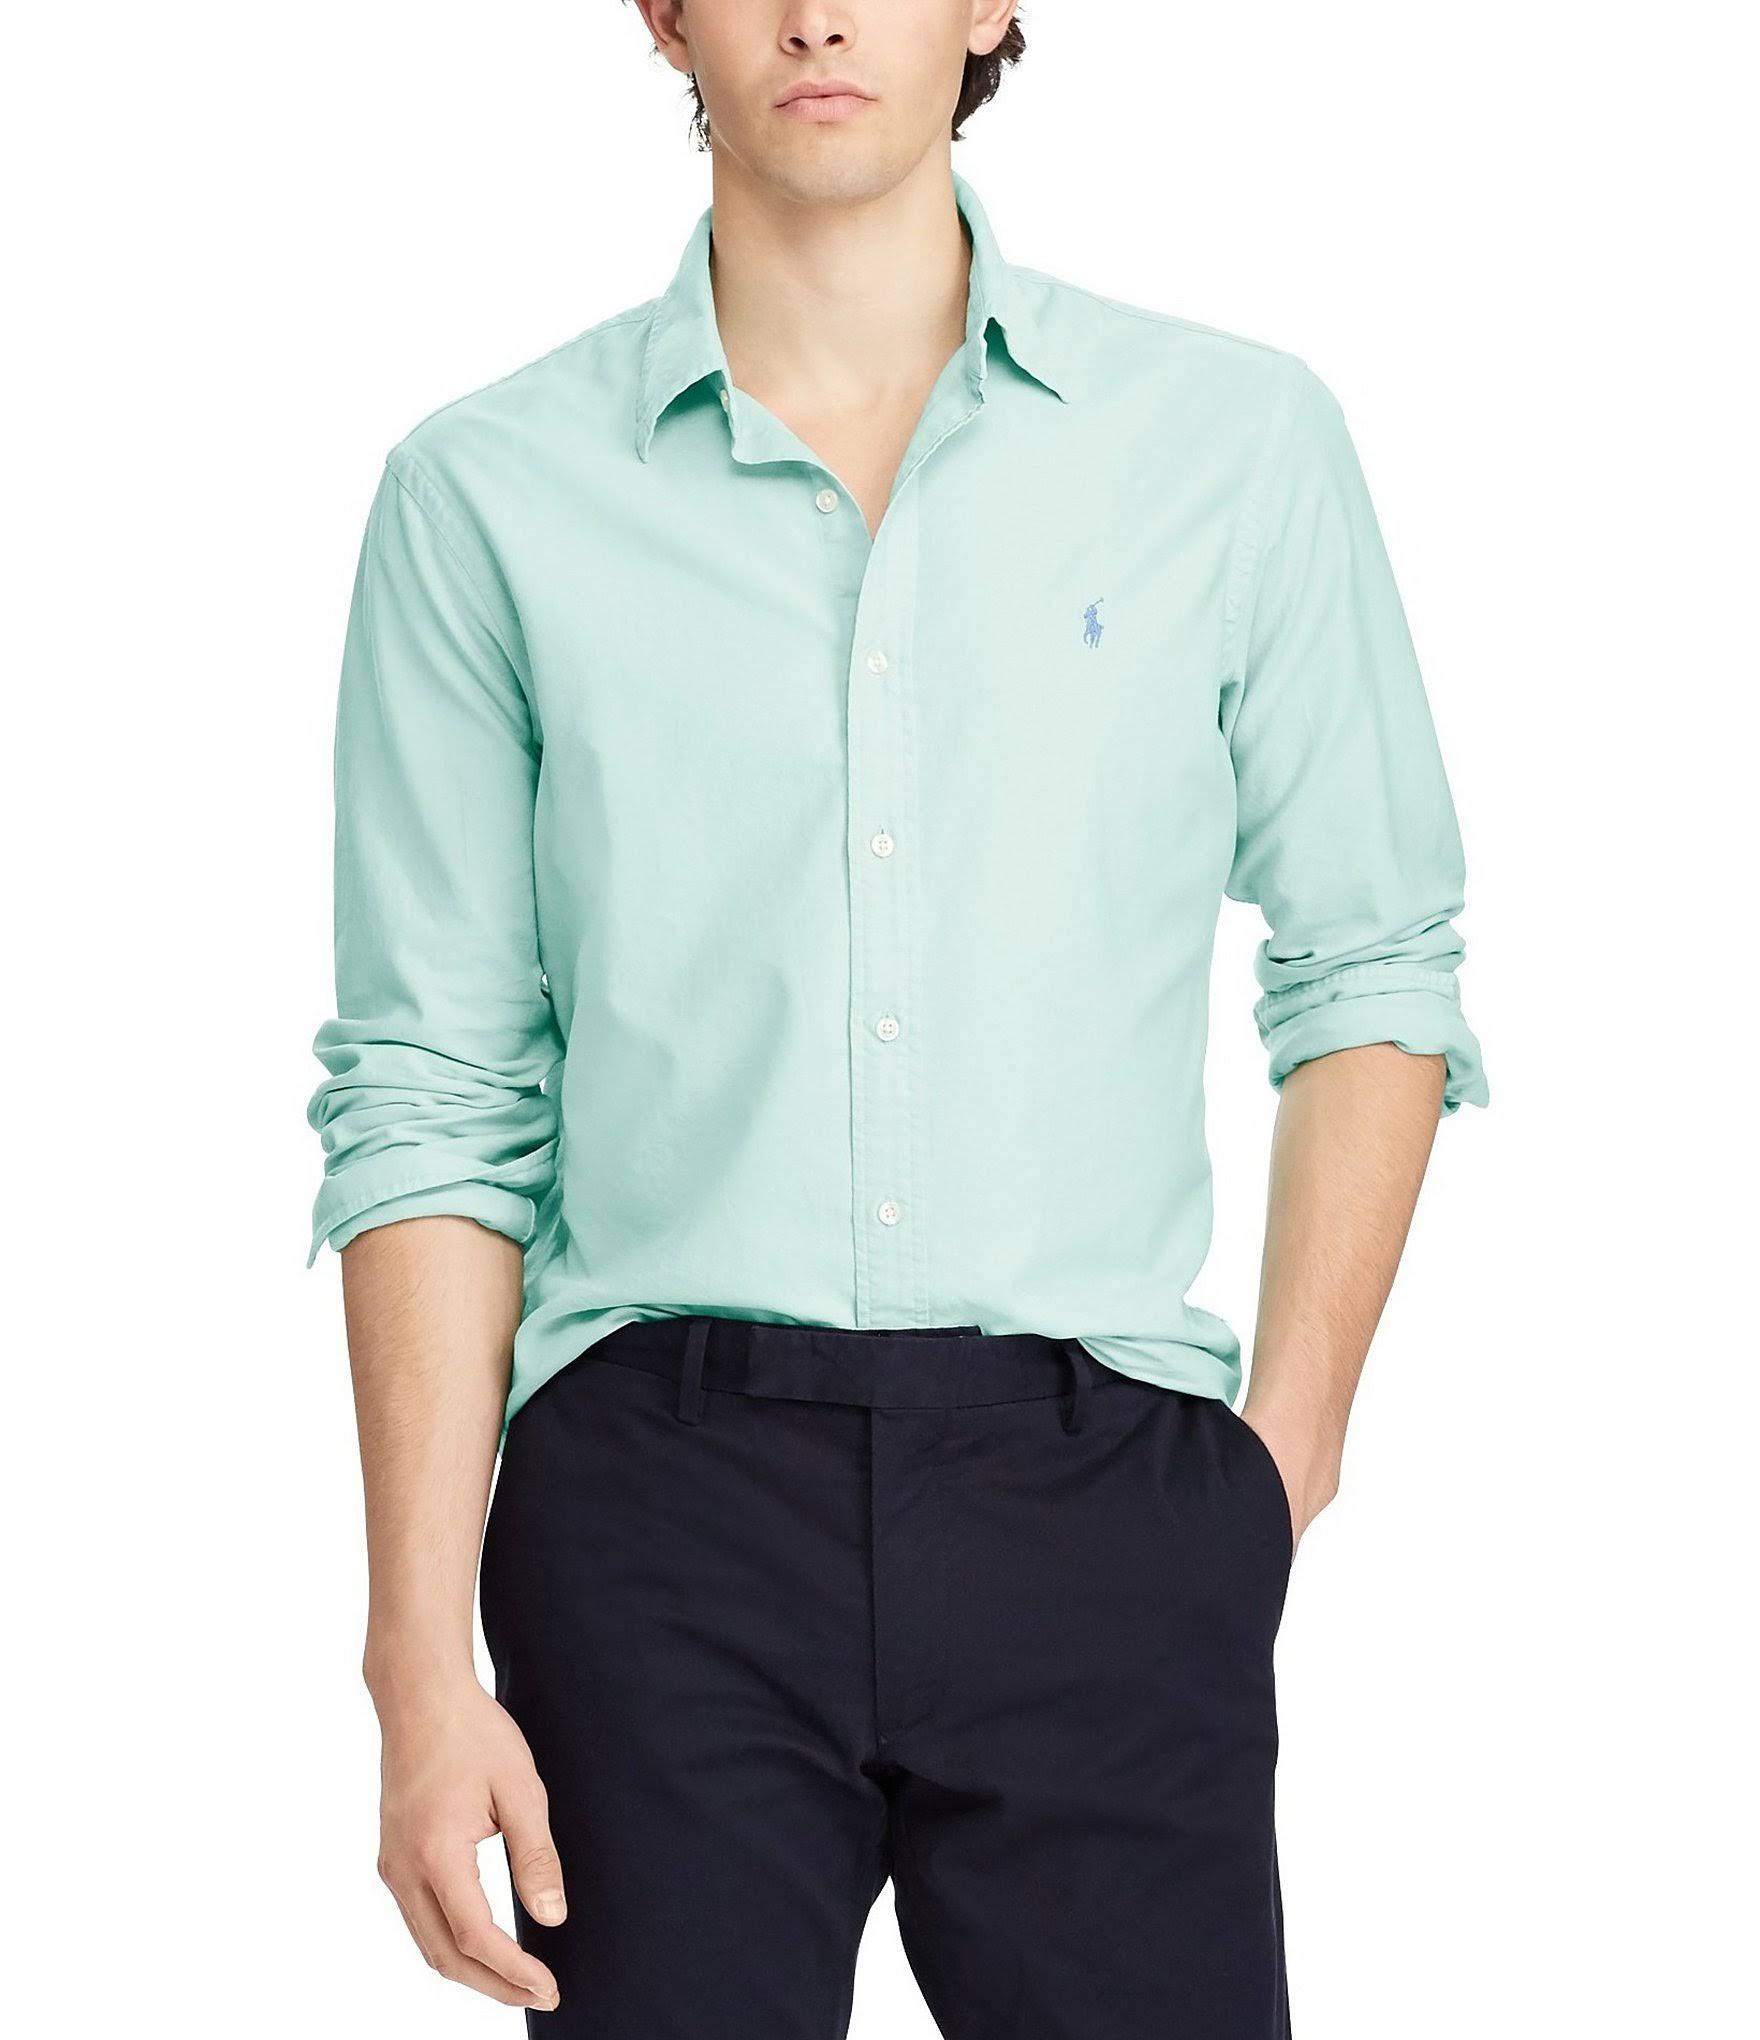 Fit Shirt Slim Green Lauren 2xl Bayside Ralph Oxford Xxl Tamaño En Iq6EcwH